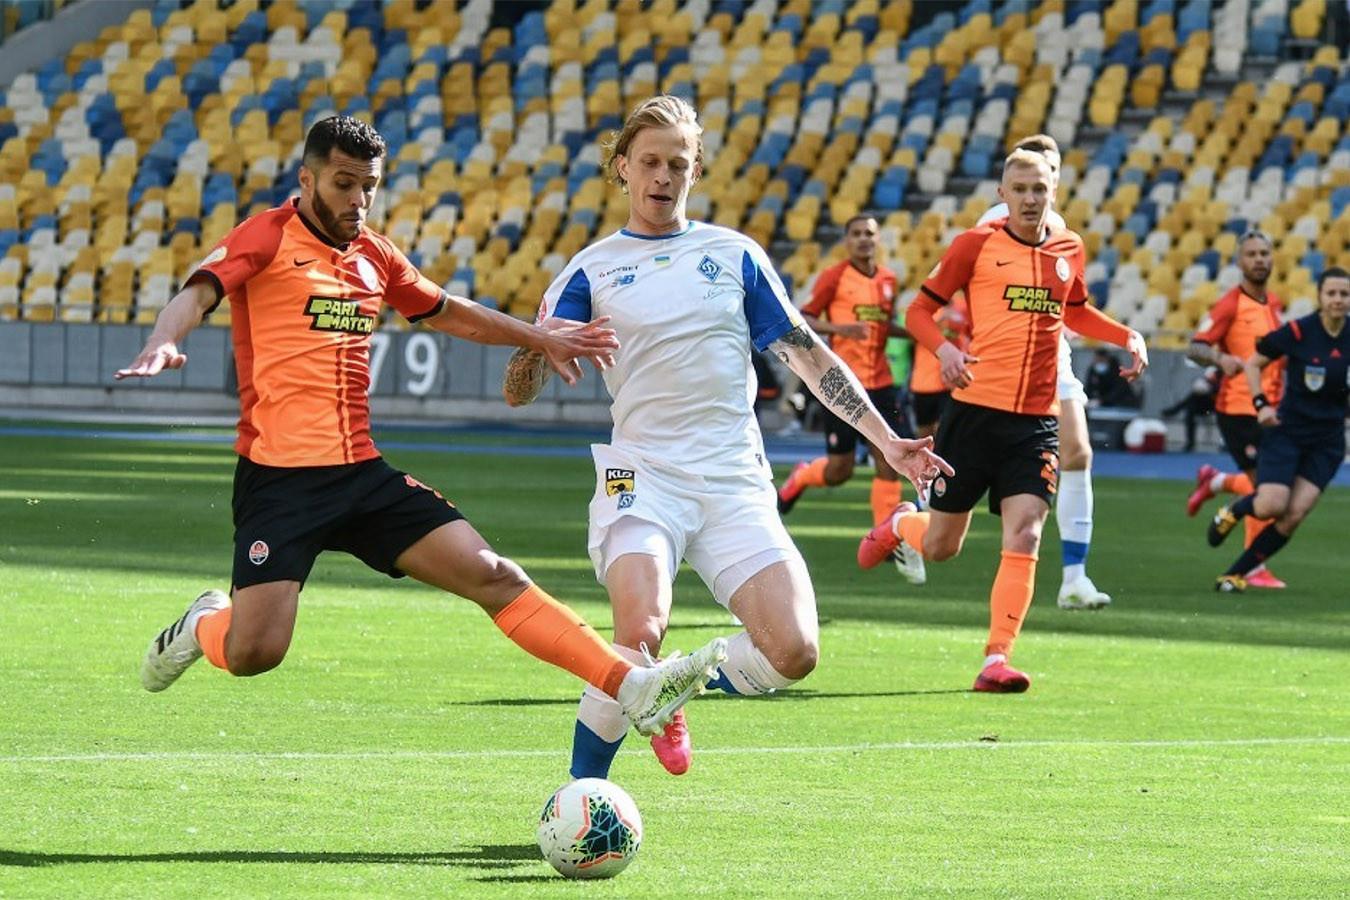 Футбол Динамо Киев - Шахтер Донецк 4.07.2020 смотреть онлайн